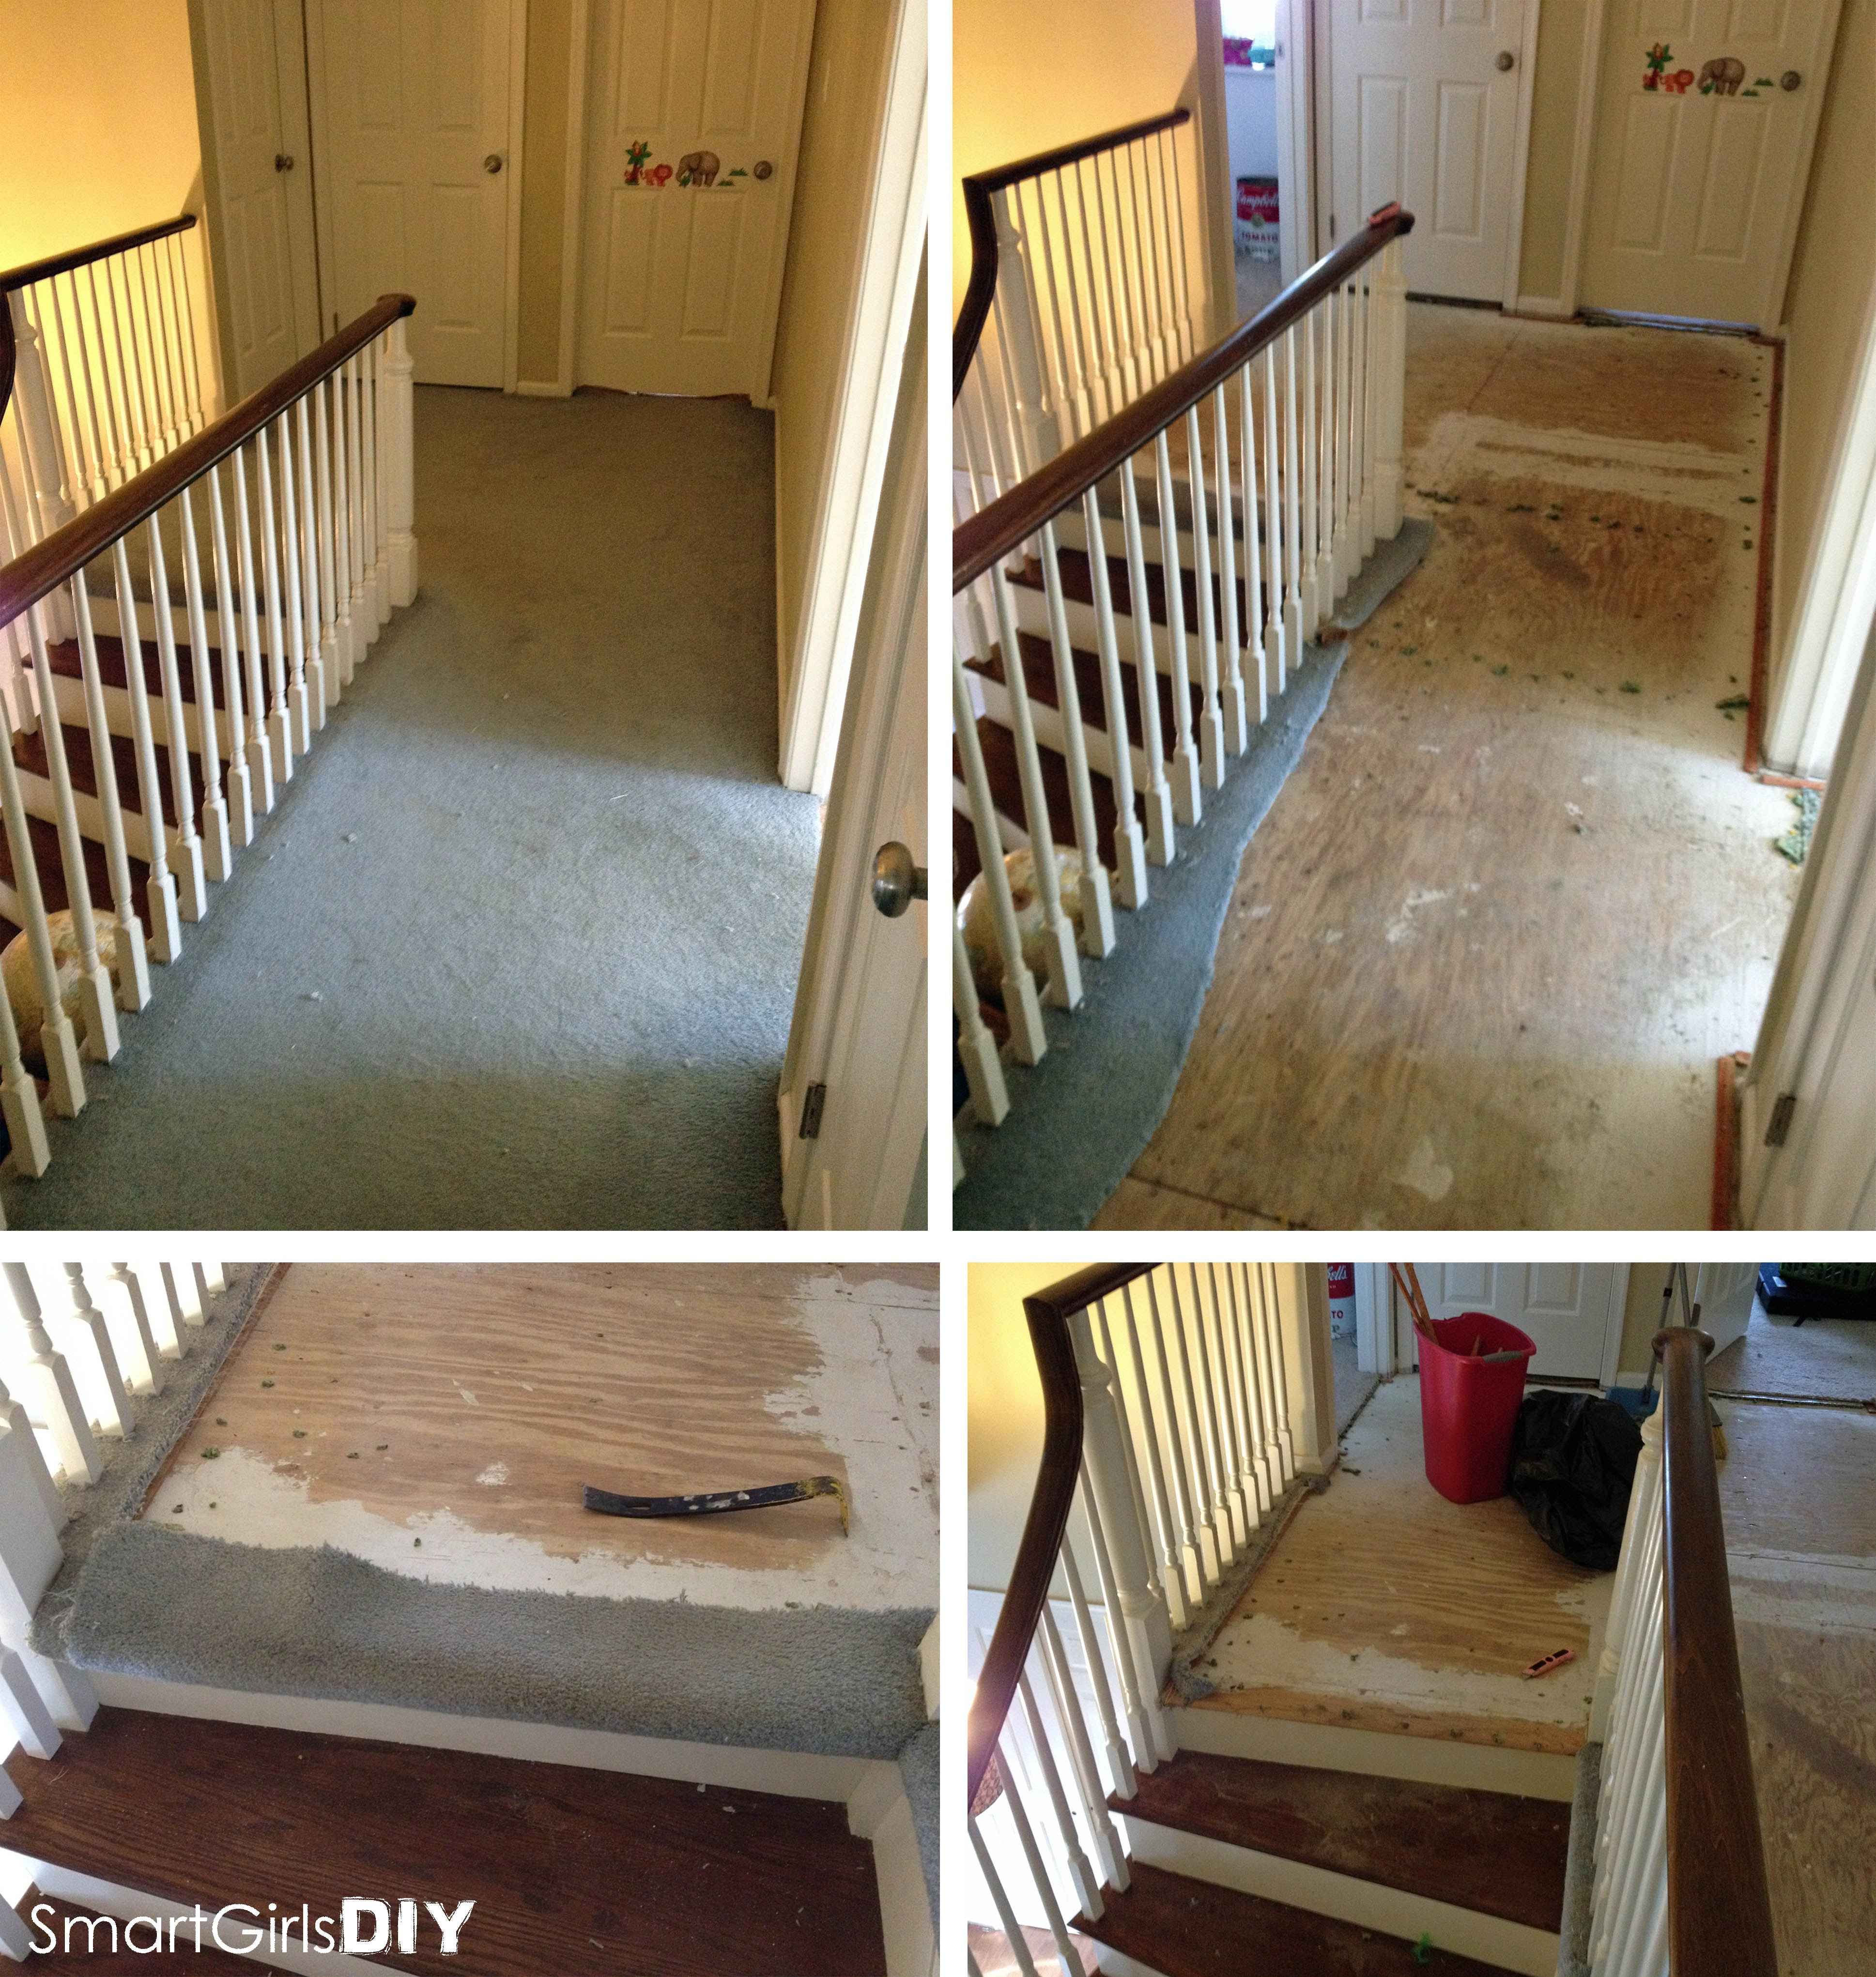 5 16 hardwood floor nailer of upstairs hallway 1 installing hardwood floors with removing carpet from hallway installing the hardwood floor